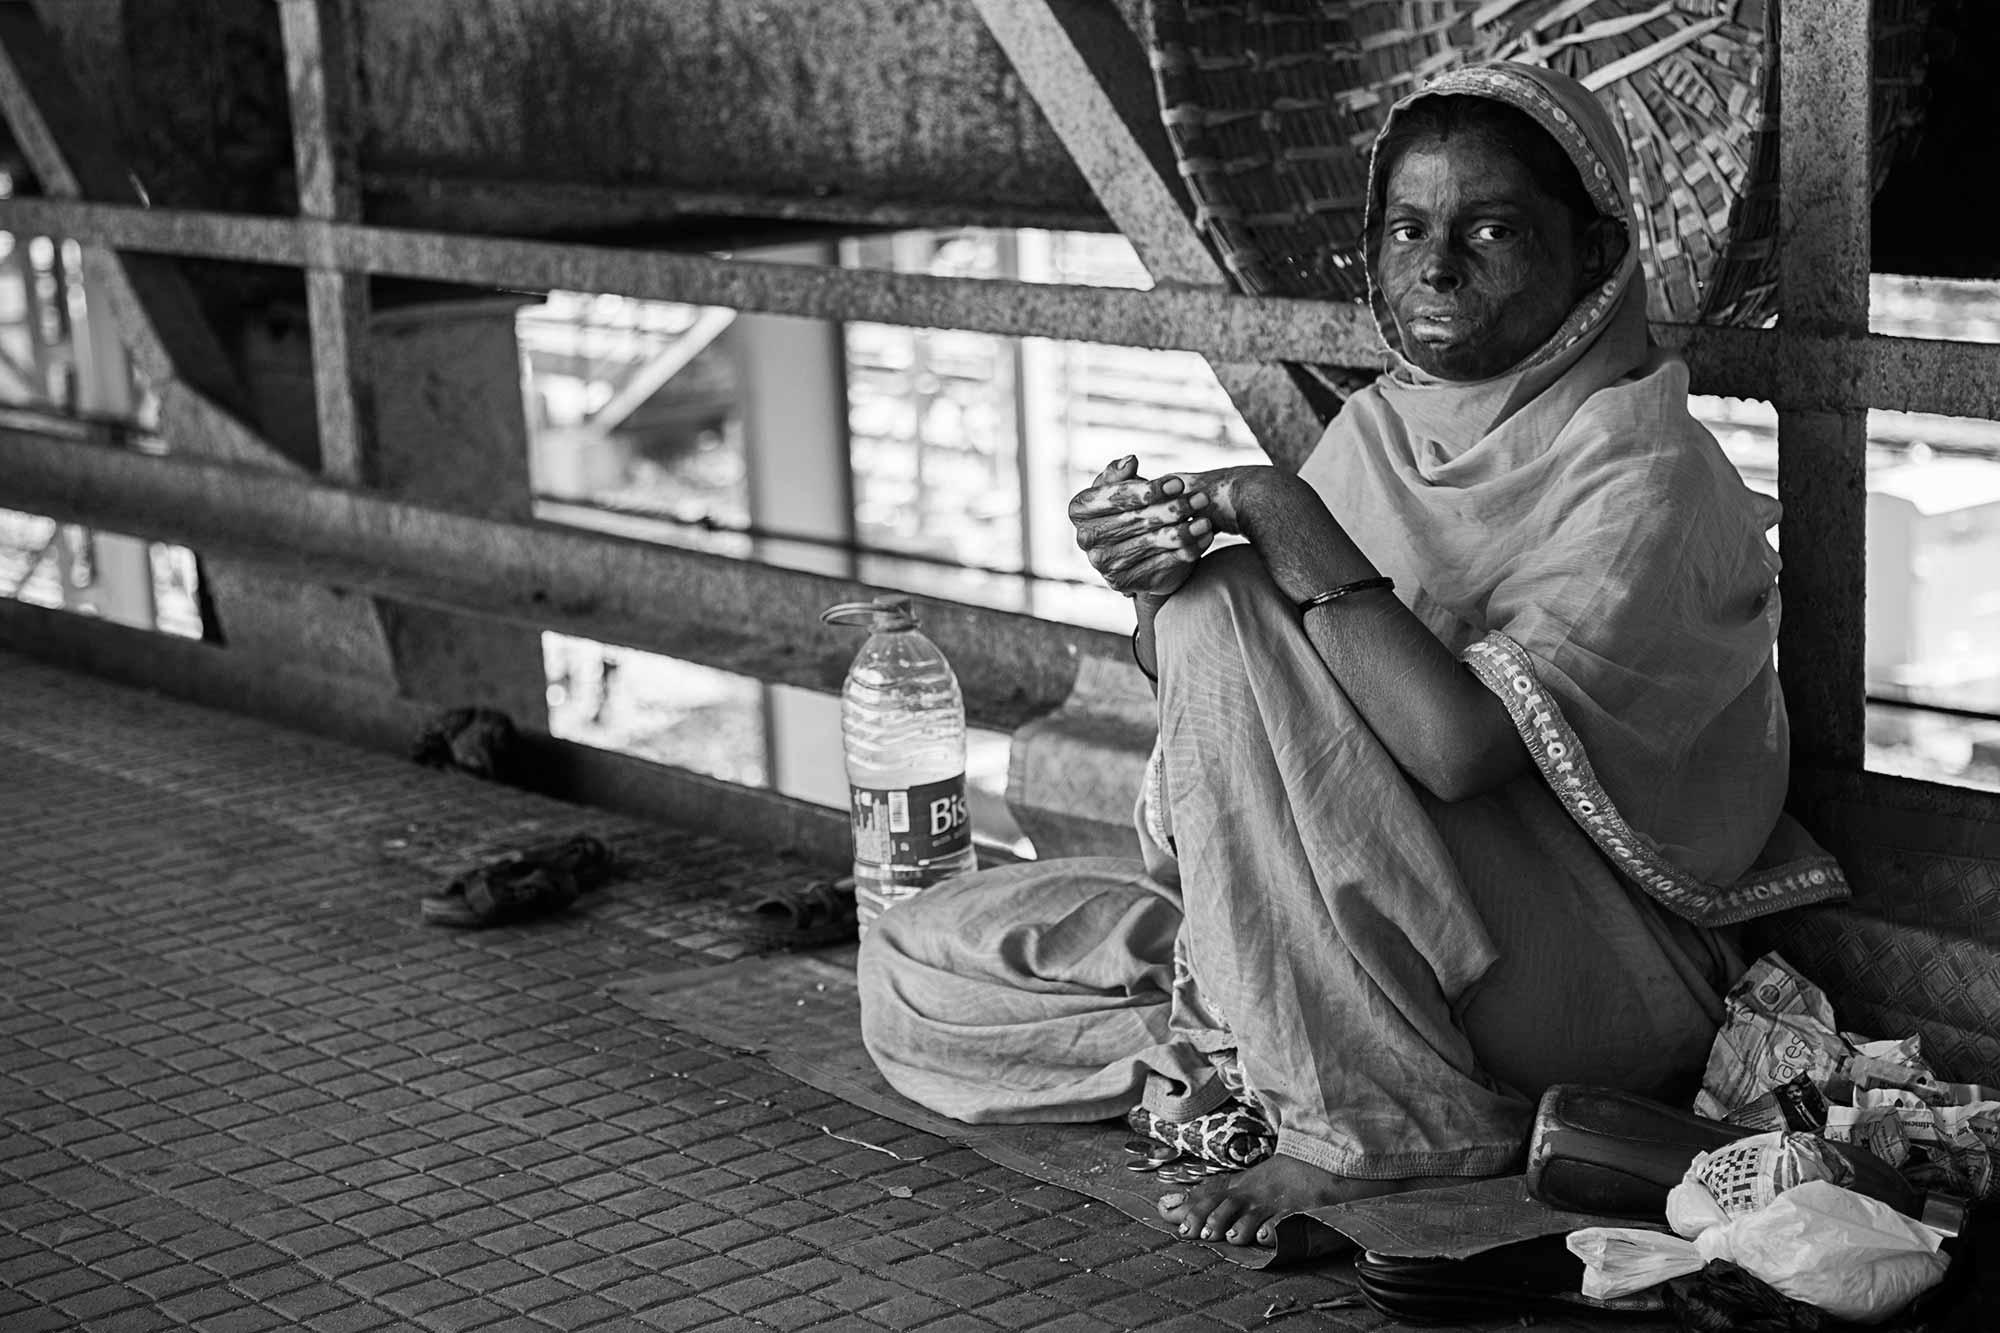 acid-victim-woman-streets-mumbai-india